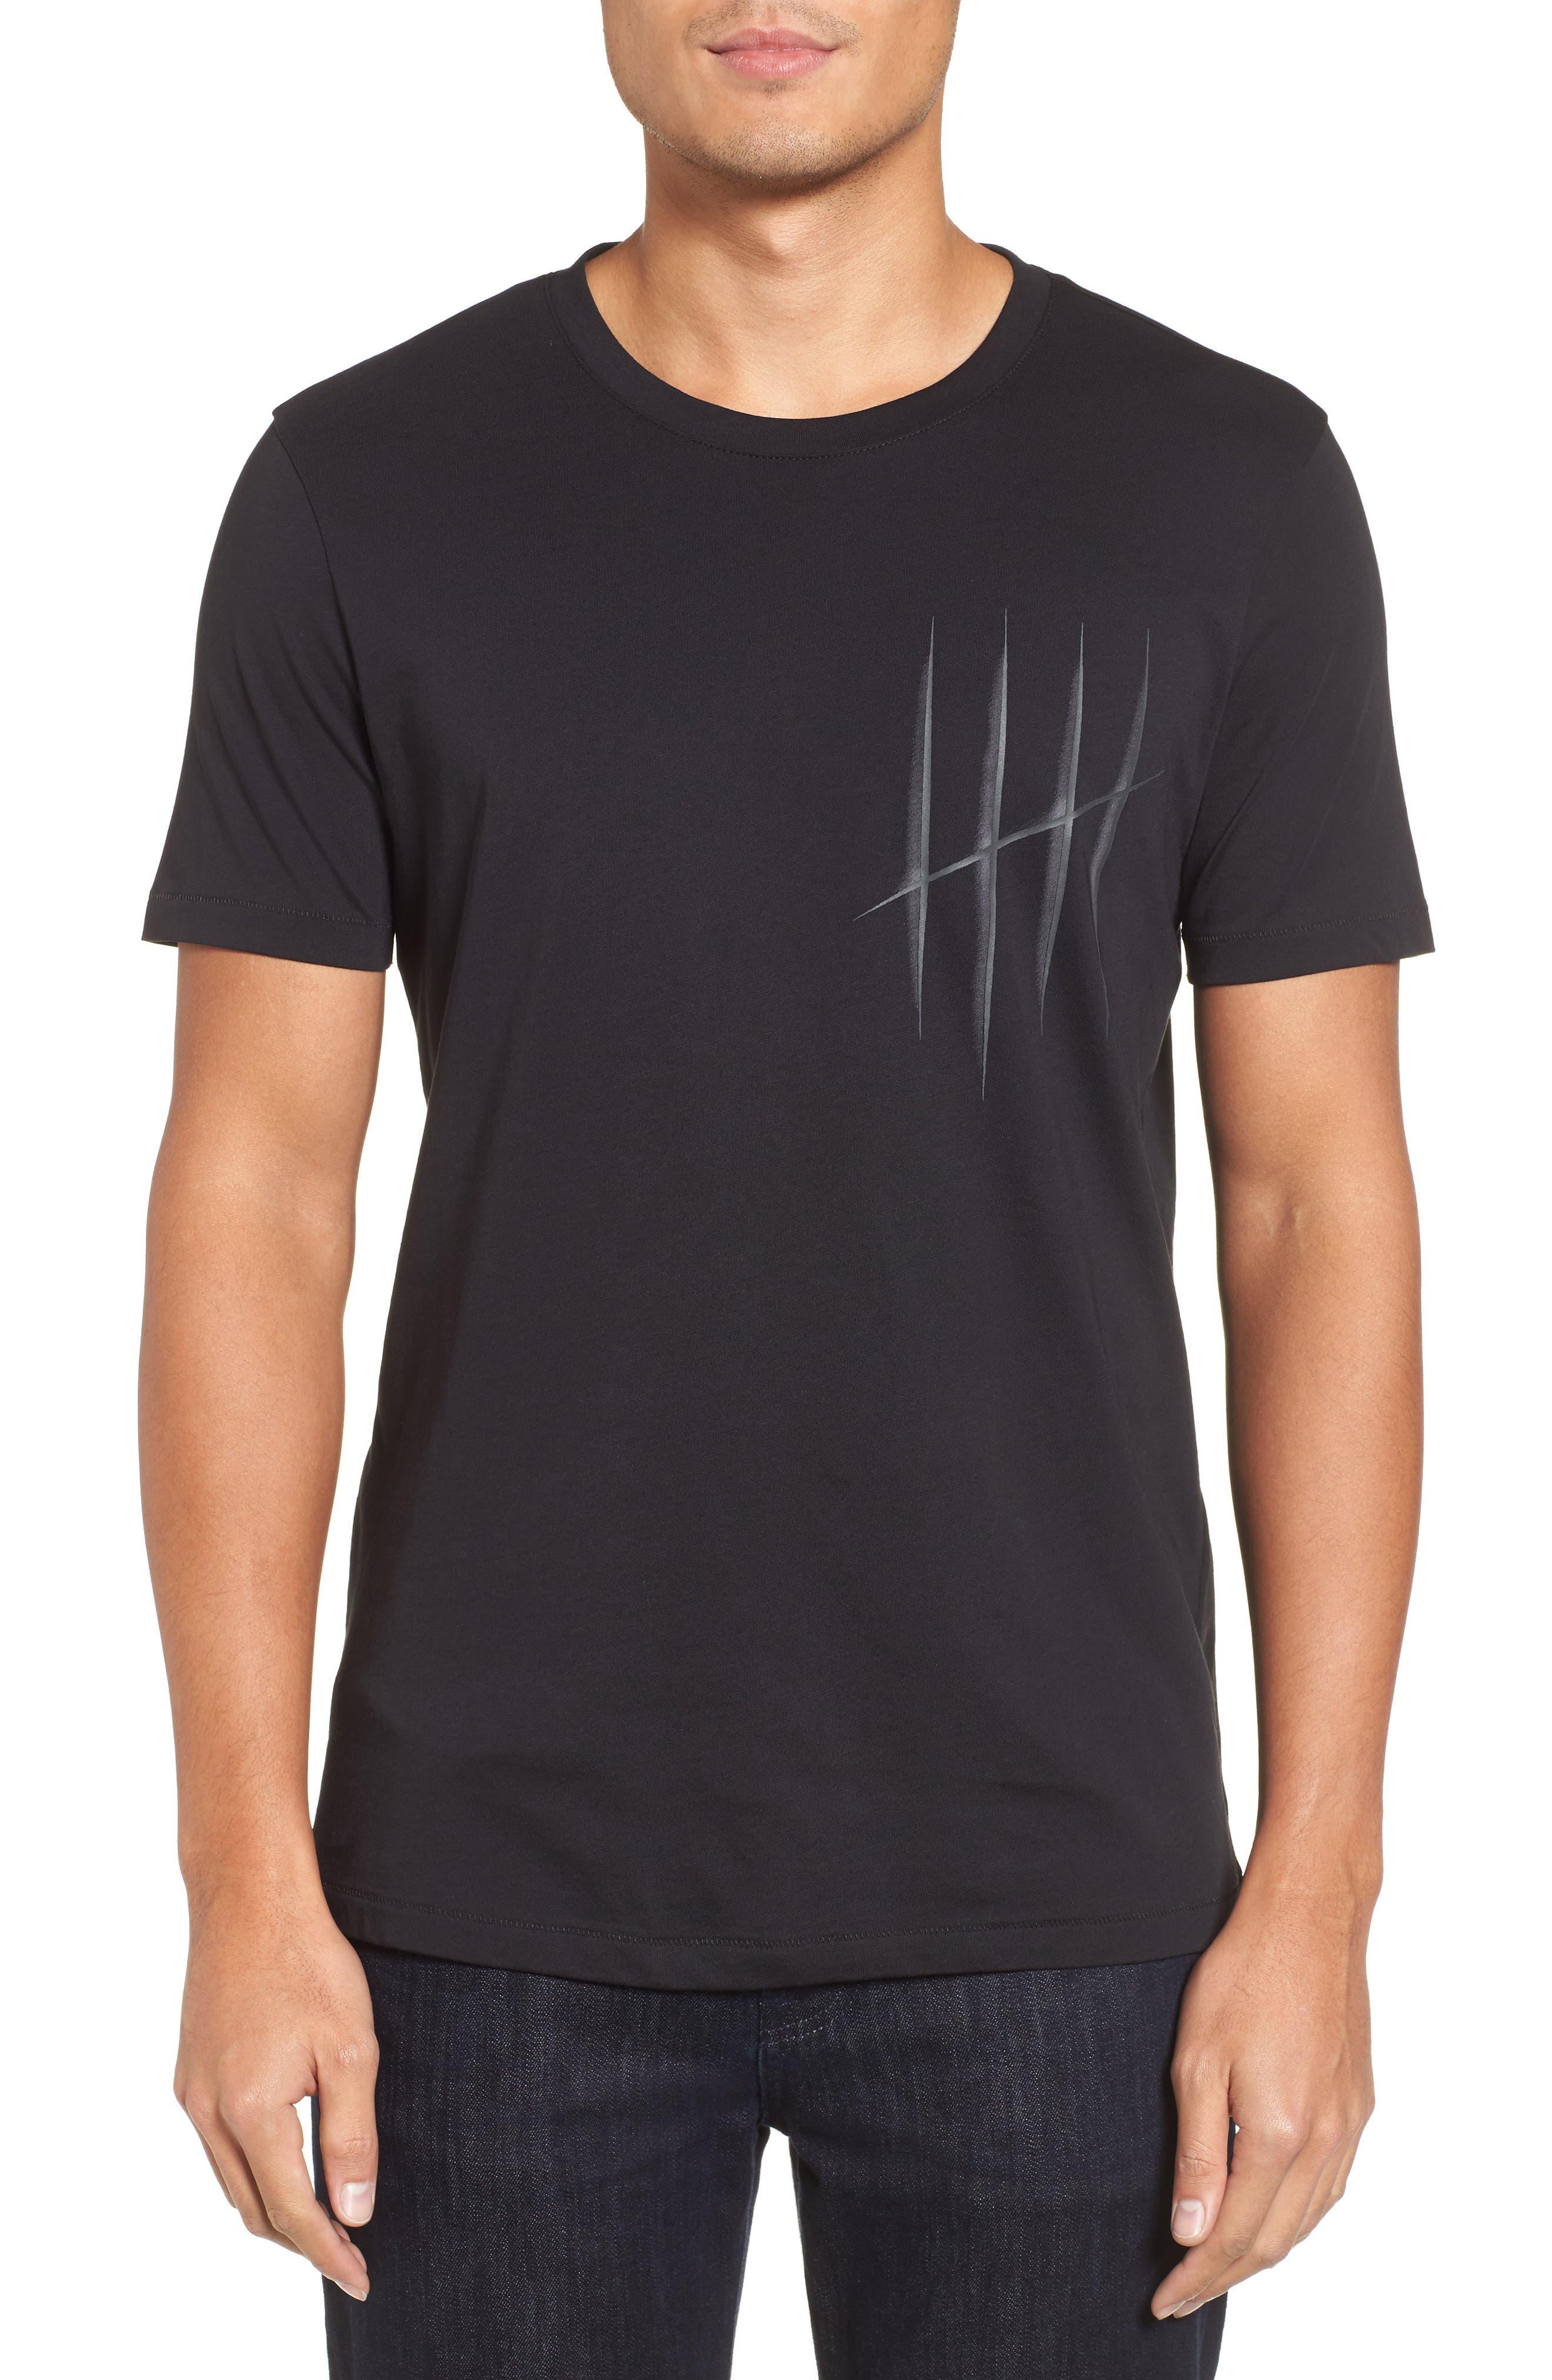 Hugo Boss Drison Hashmark Graphic T-Shirt,                         Main,                         color,